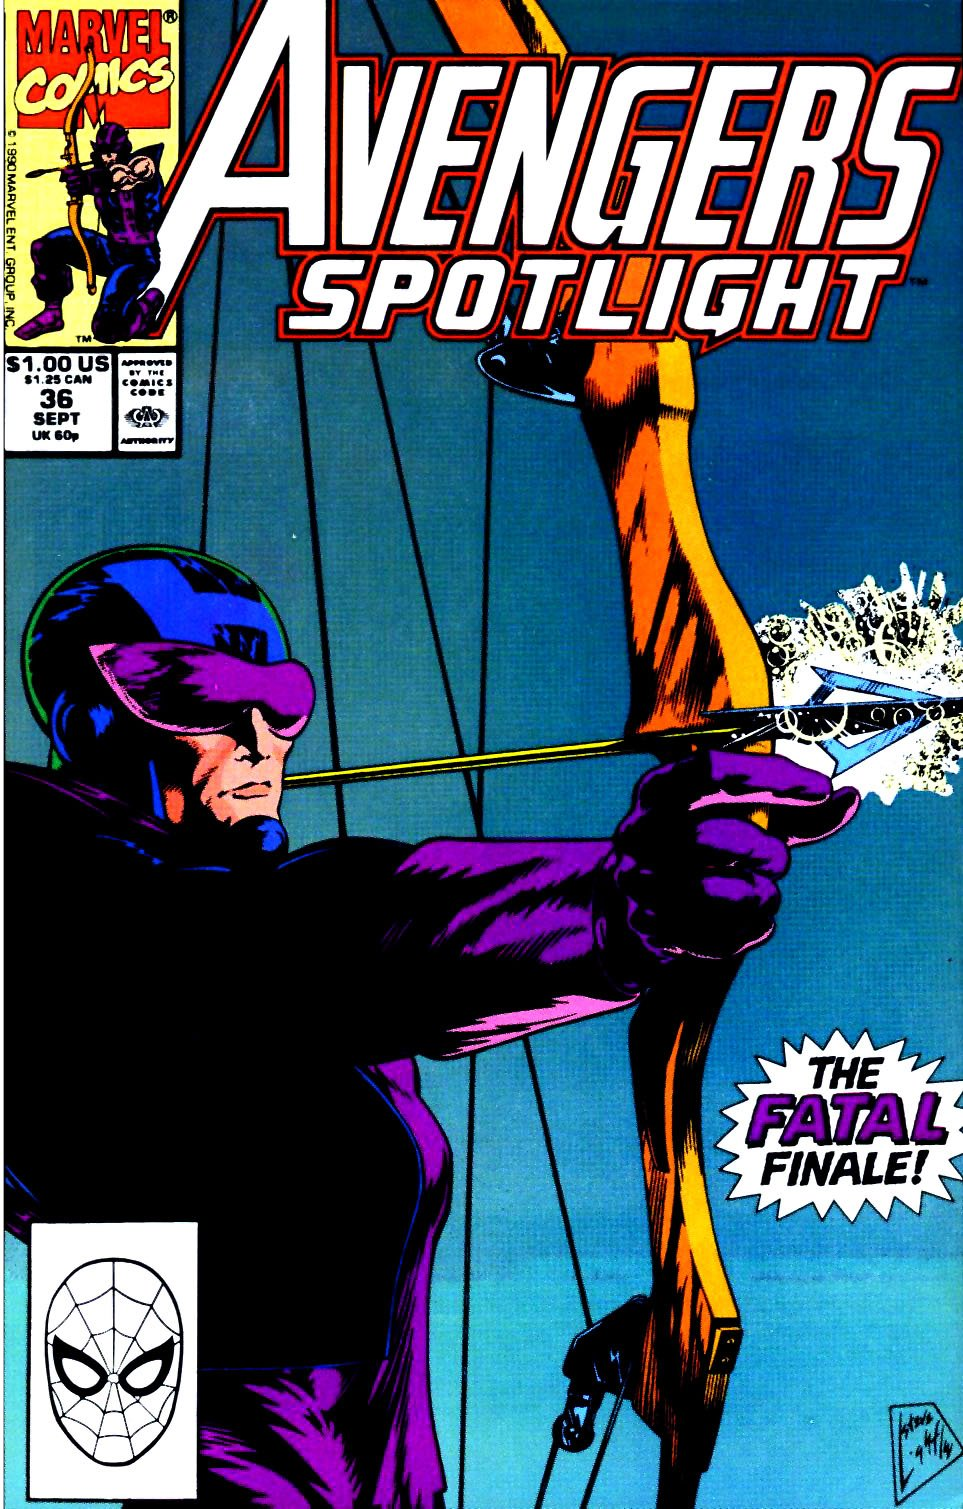 Avengers Spotlight 36 Page 1